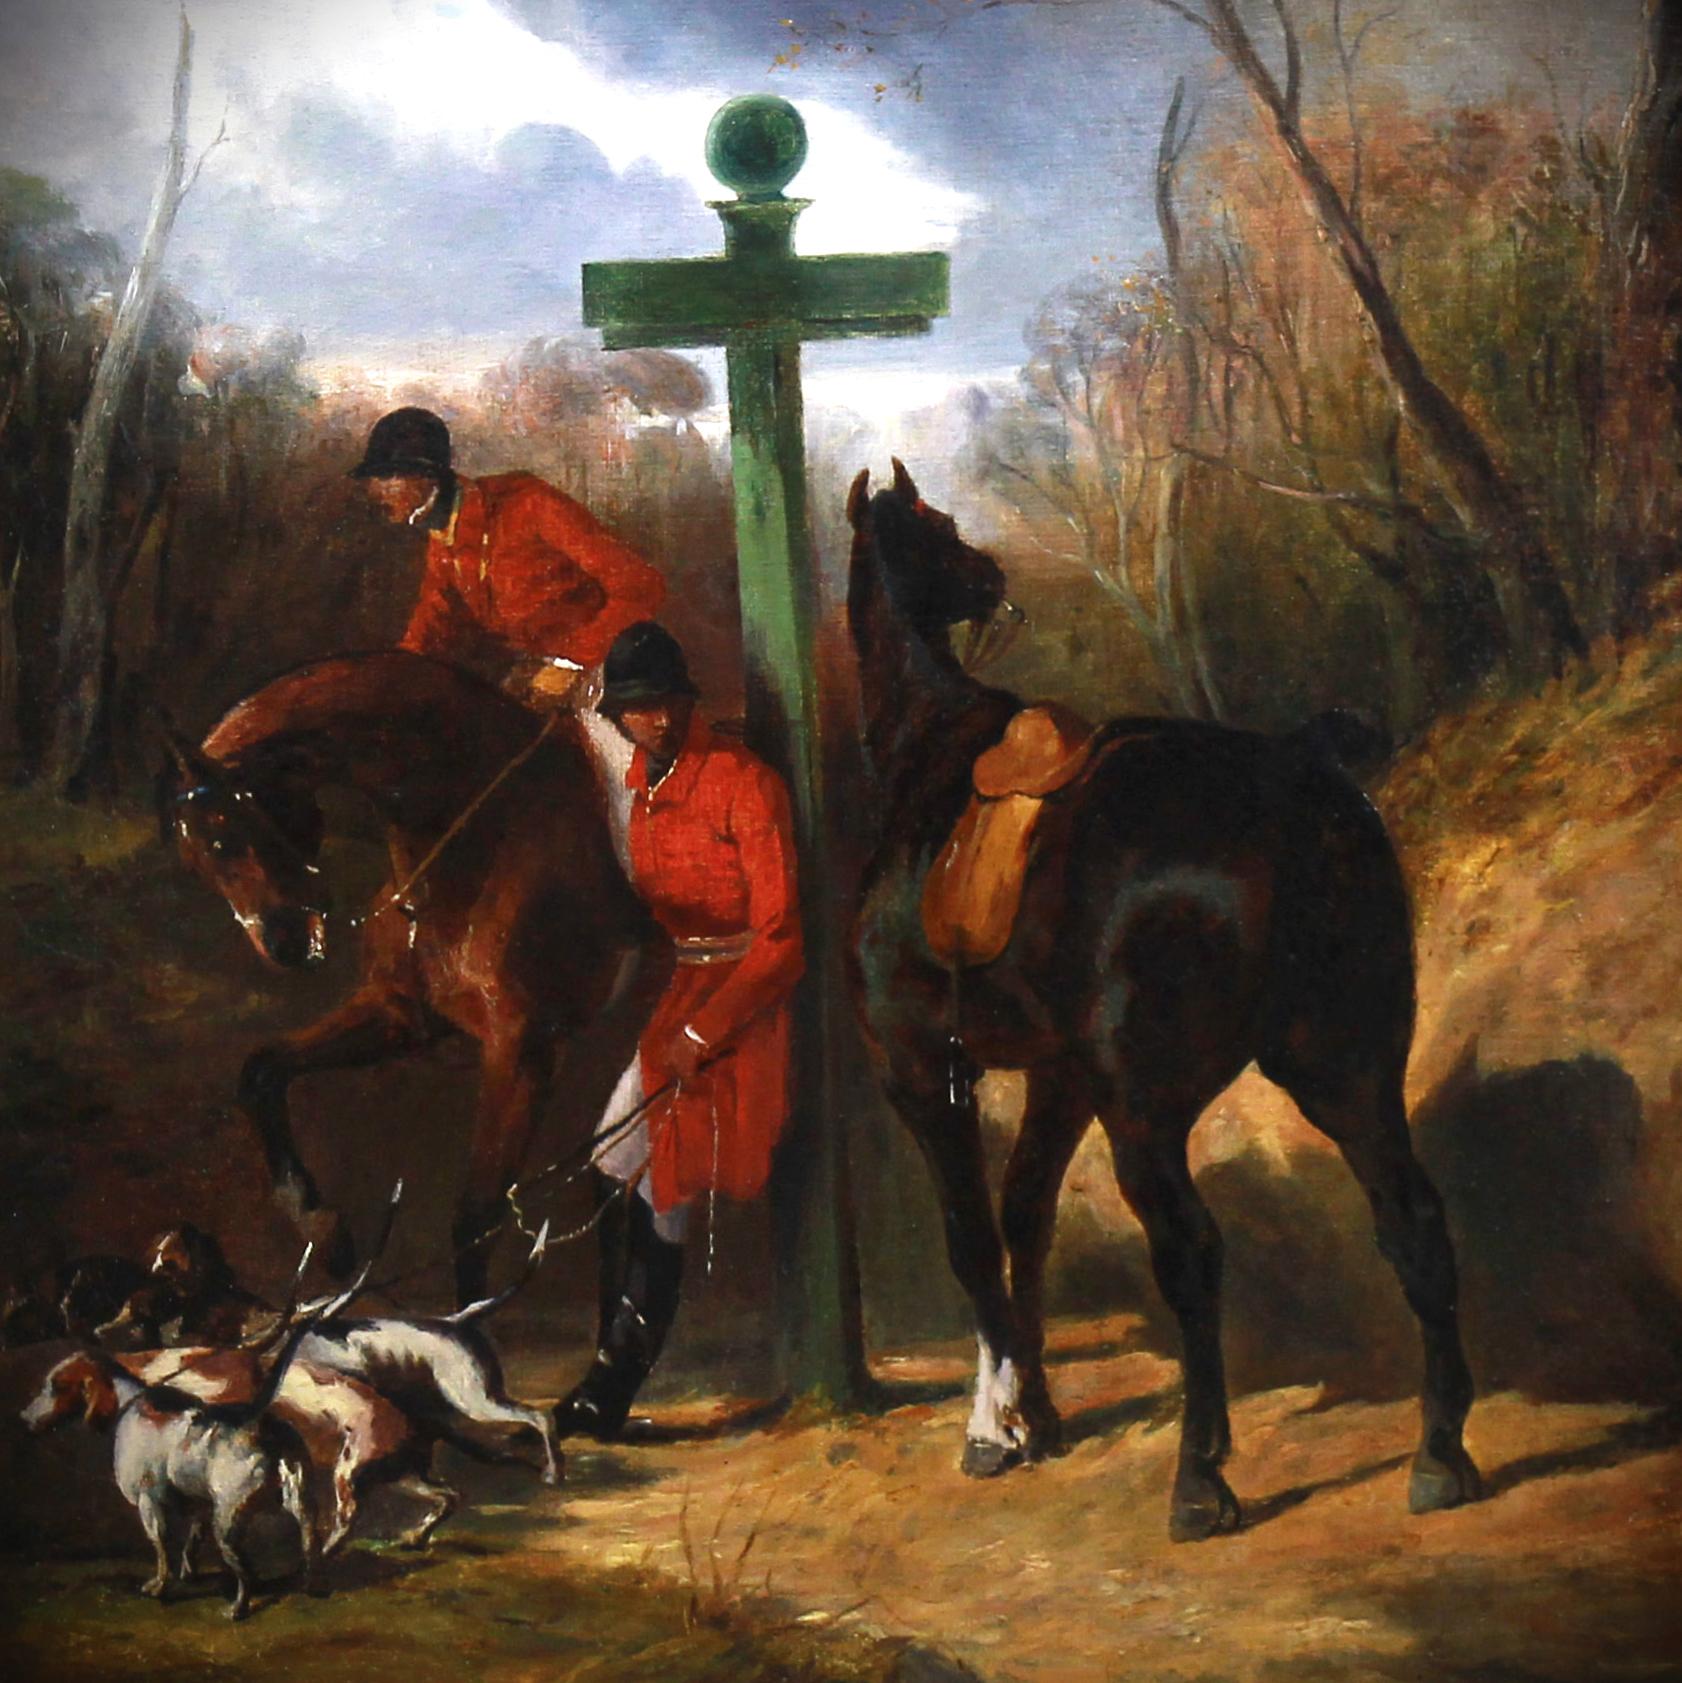 Exclusive hunting scene Halte de chasseurs by Alfred De Dreux